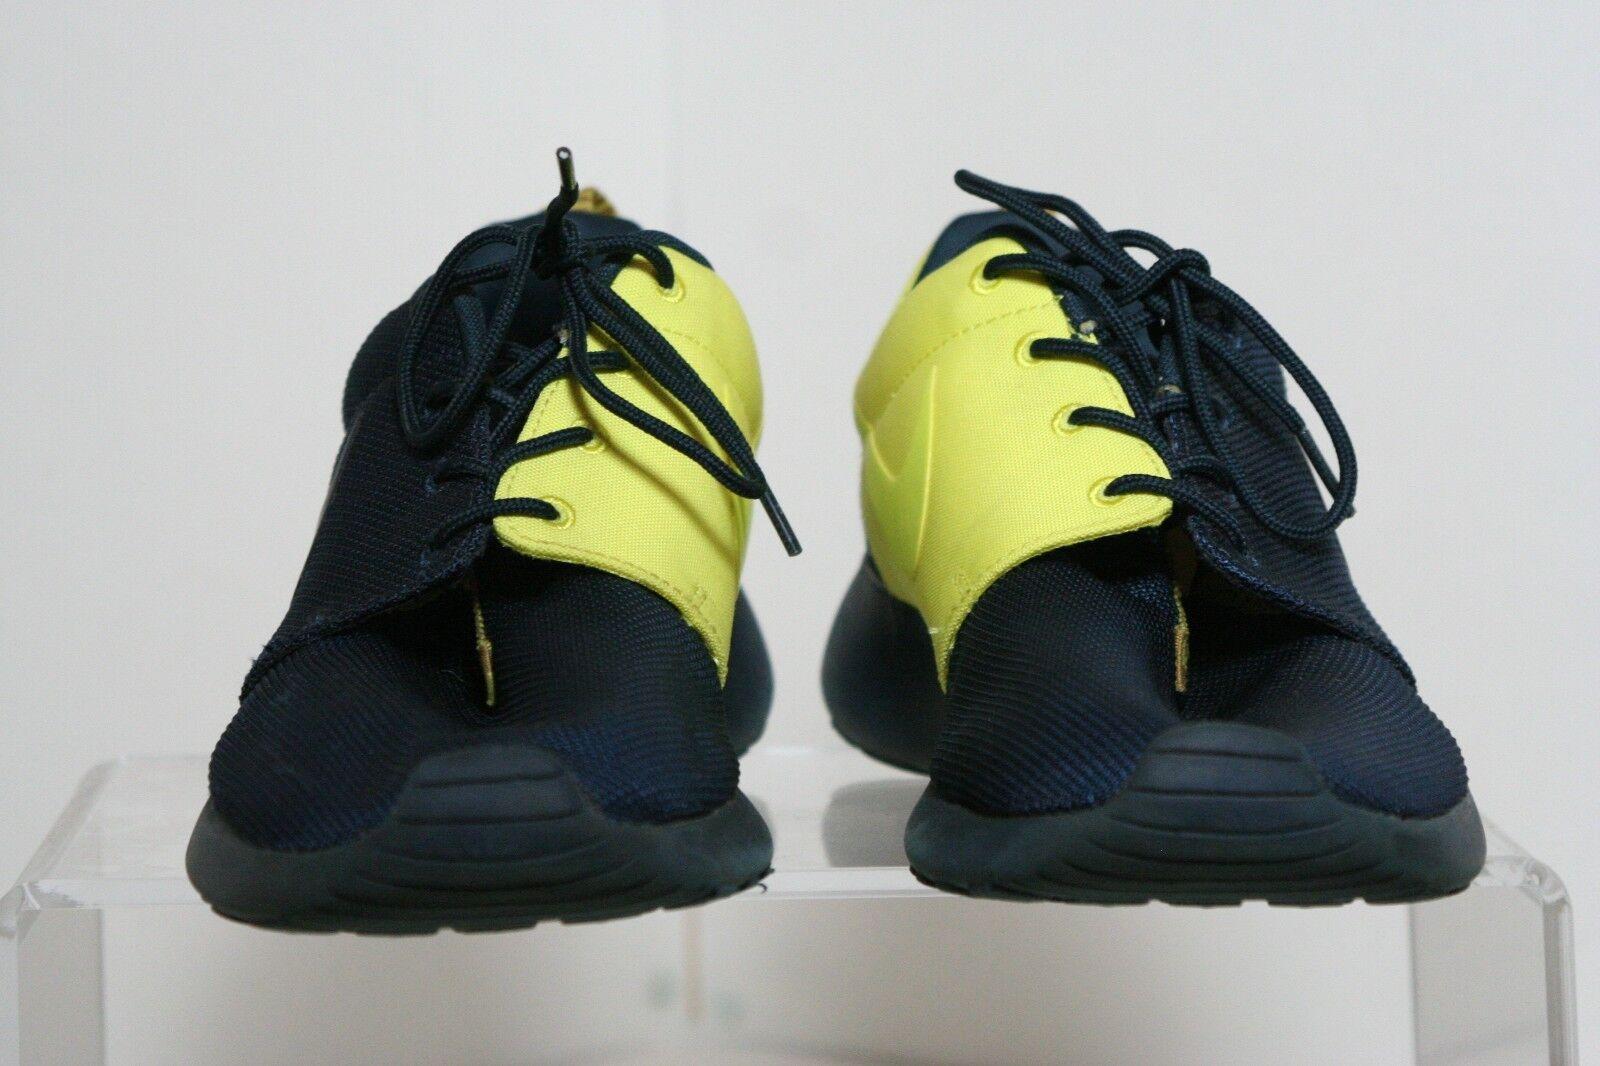 Nike air max fury uomini scarpe da dimensioni: corsa dimensioni: da 11 cool grey volt aa5739 007 e26261